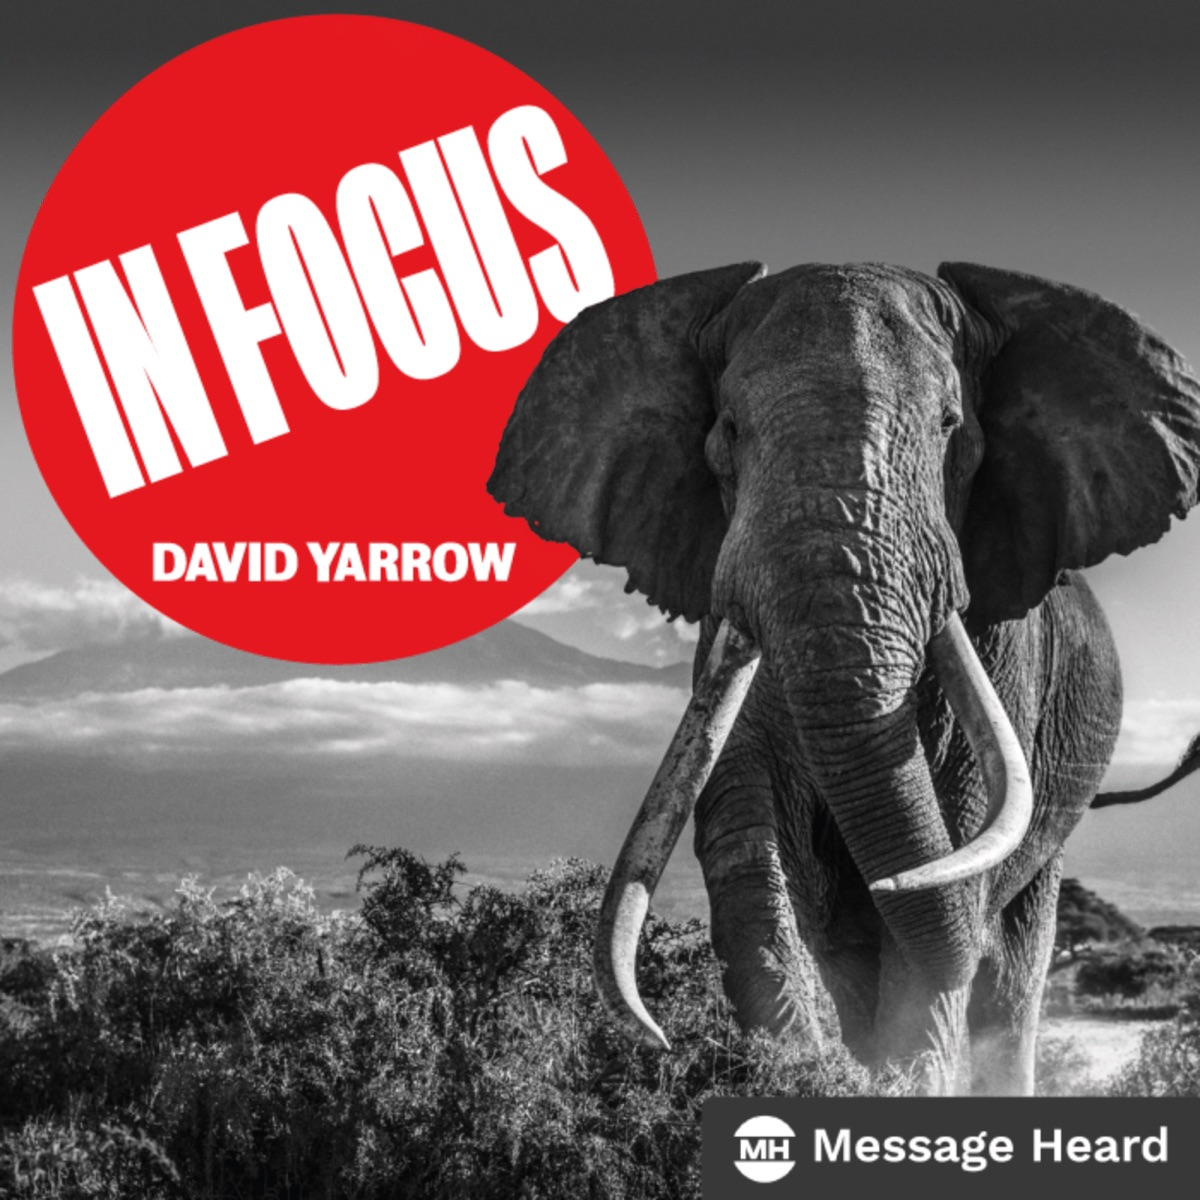 In Focus with David Yarrow